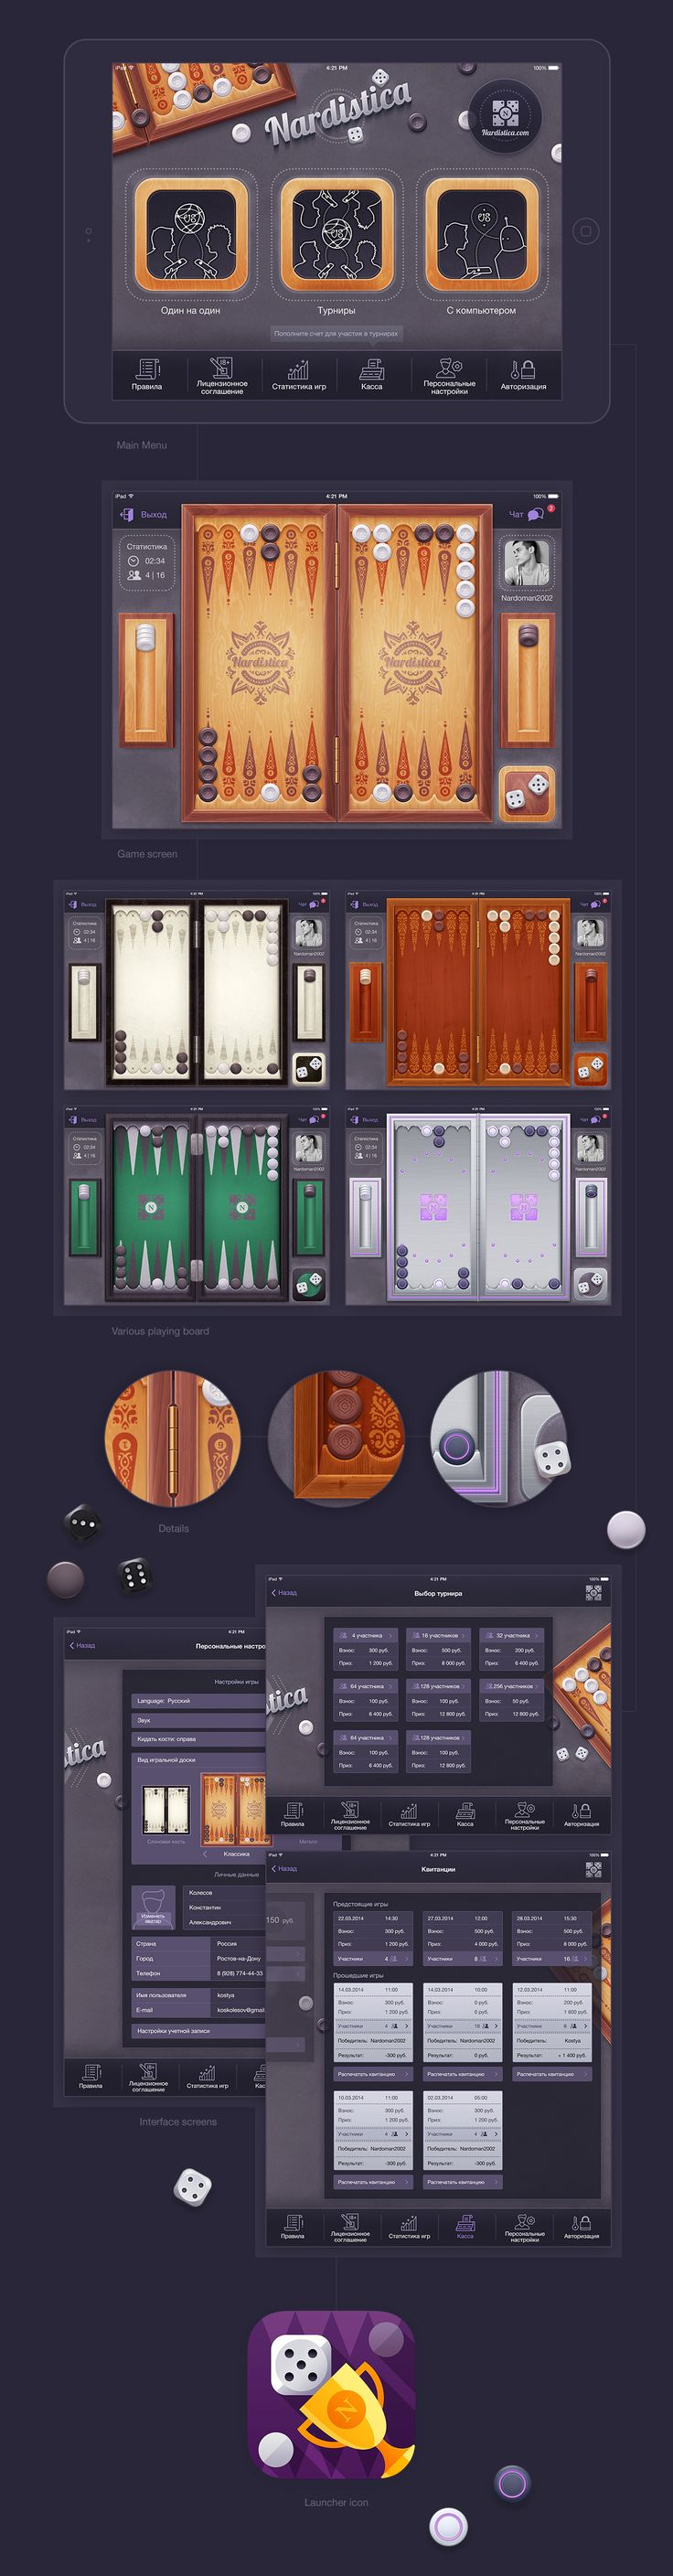 Interface_screens